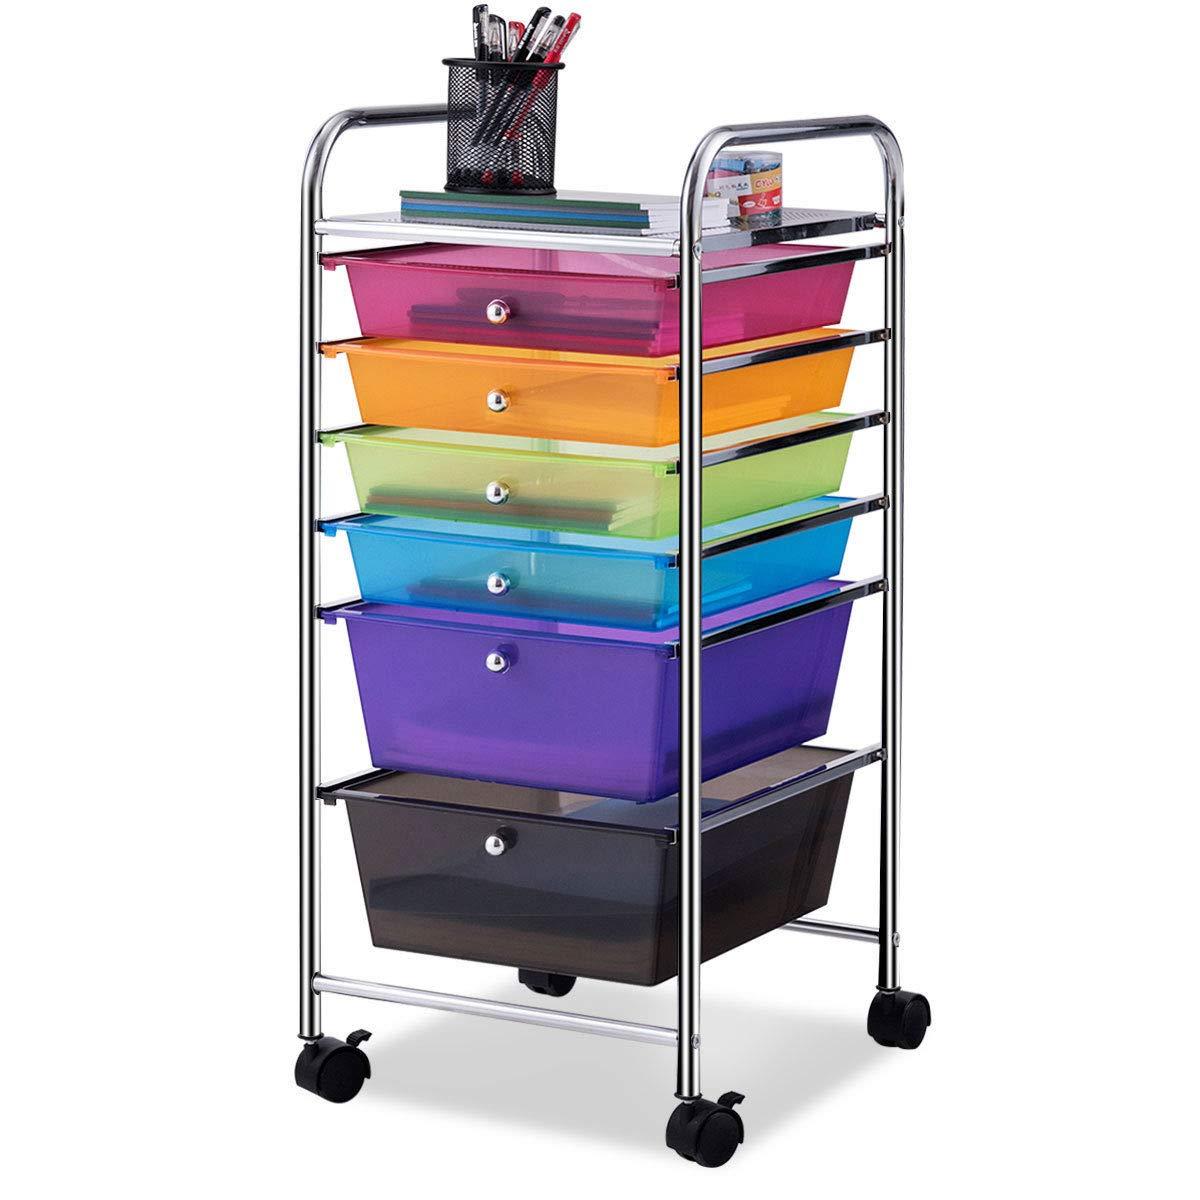 Giantex 6 Drawer Rolling Storage Cart Tools Scrapbook Paper Office School Organizer by Giantex